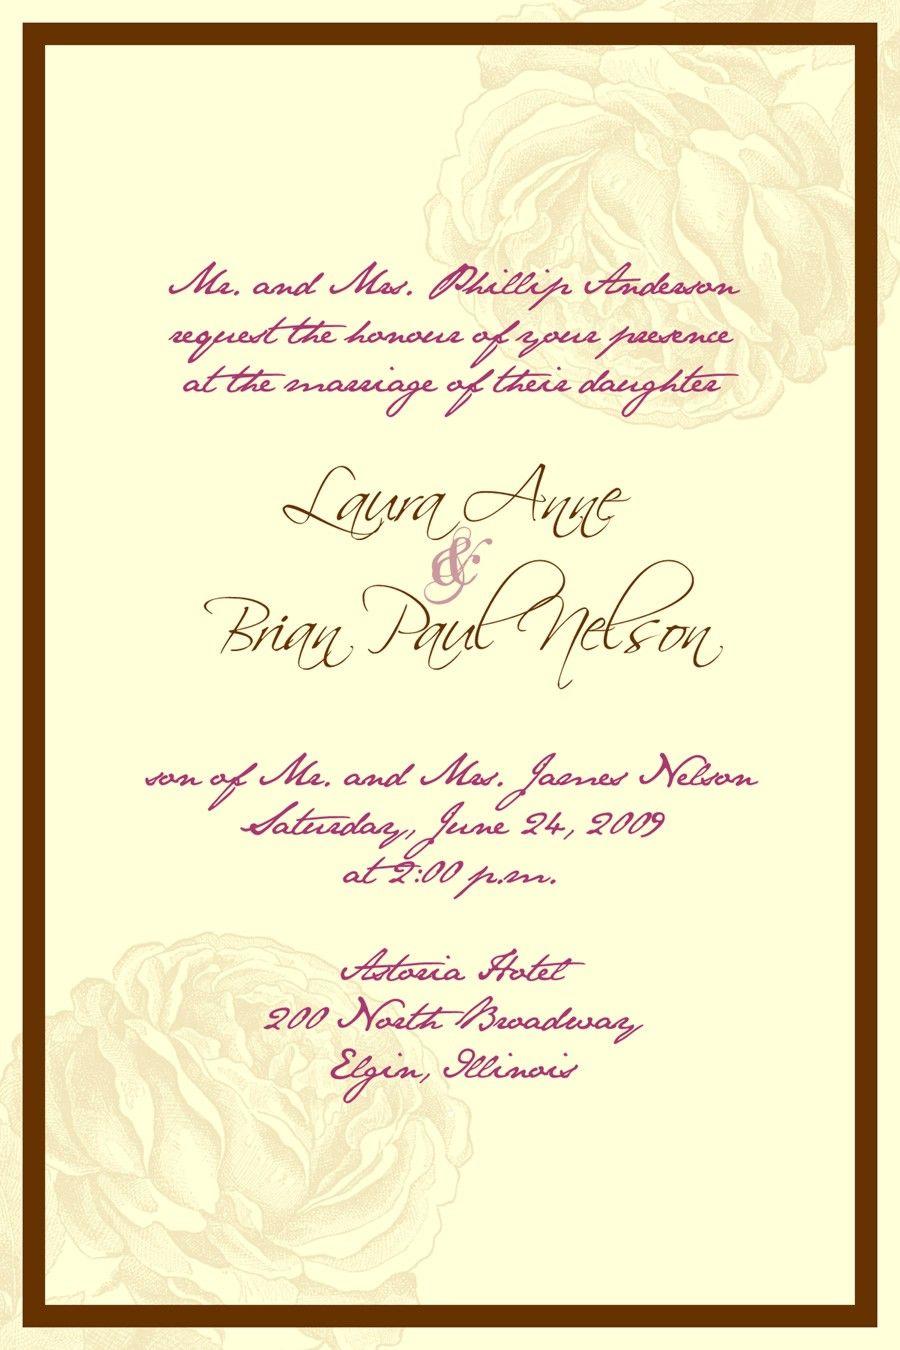 wedding invitation wording Google Search 41214 Pinterest